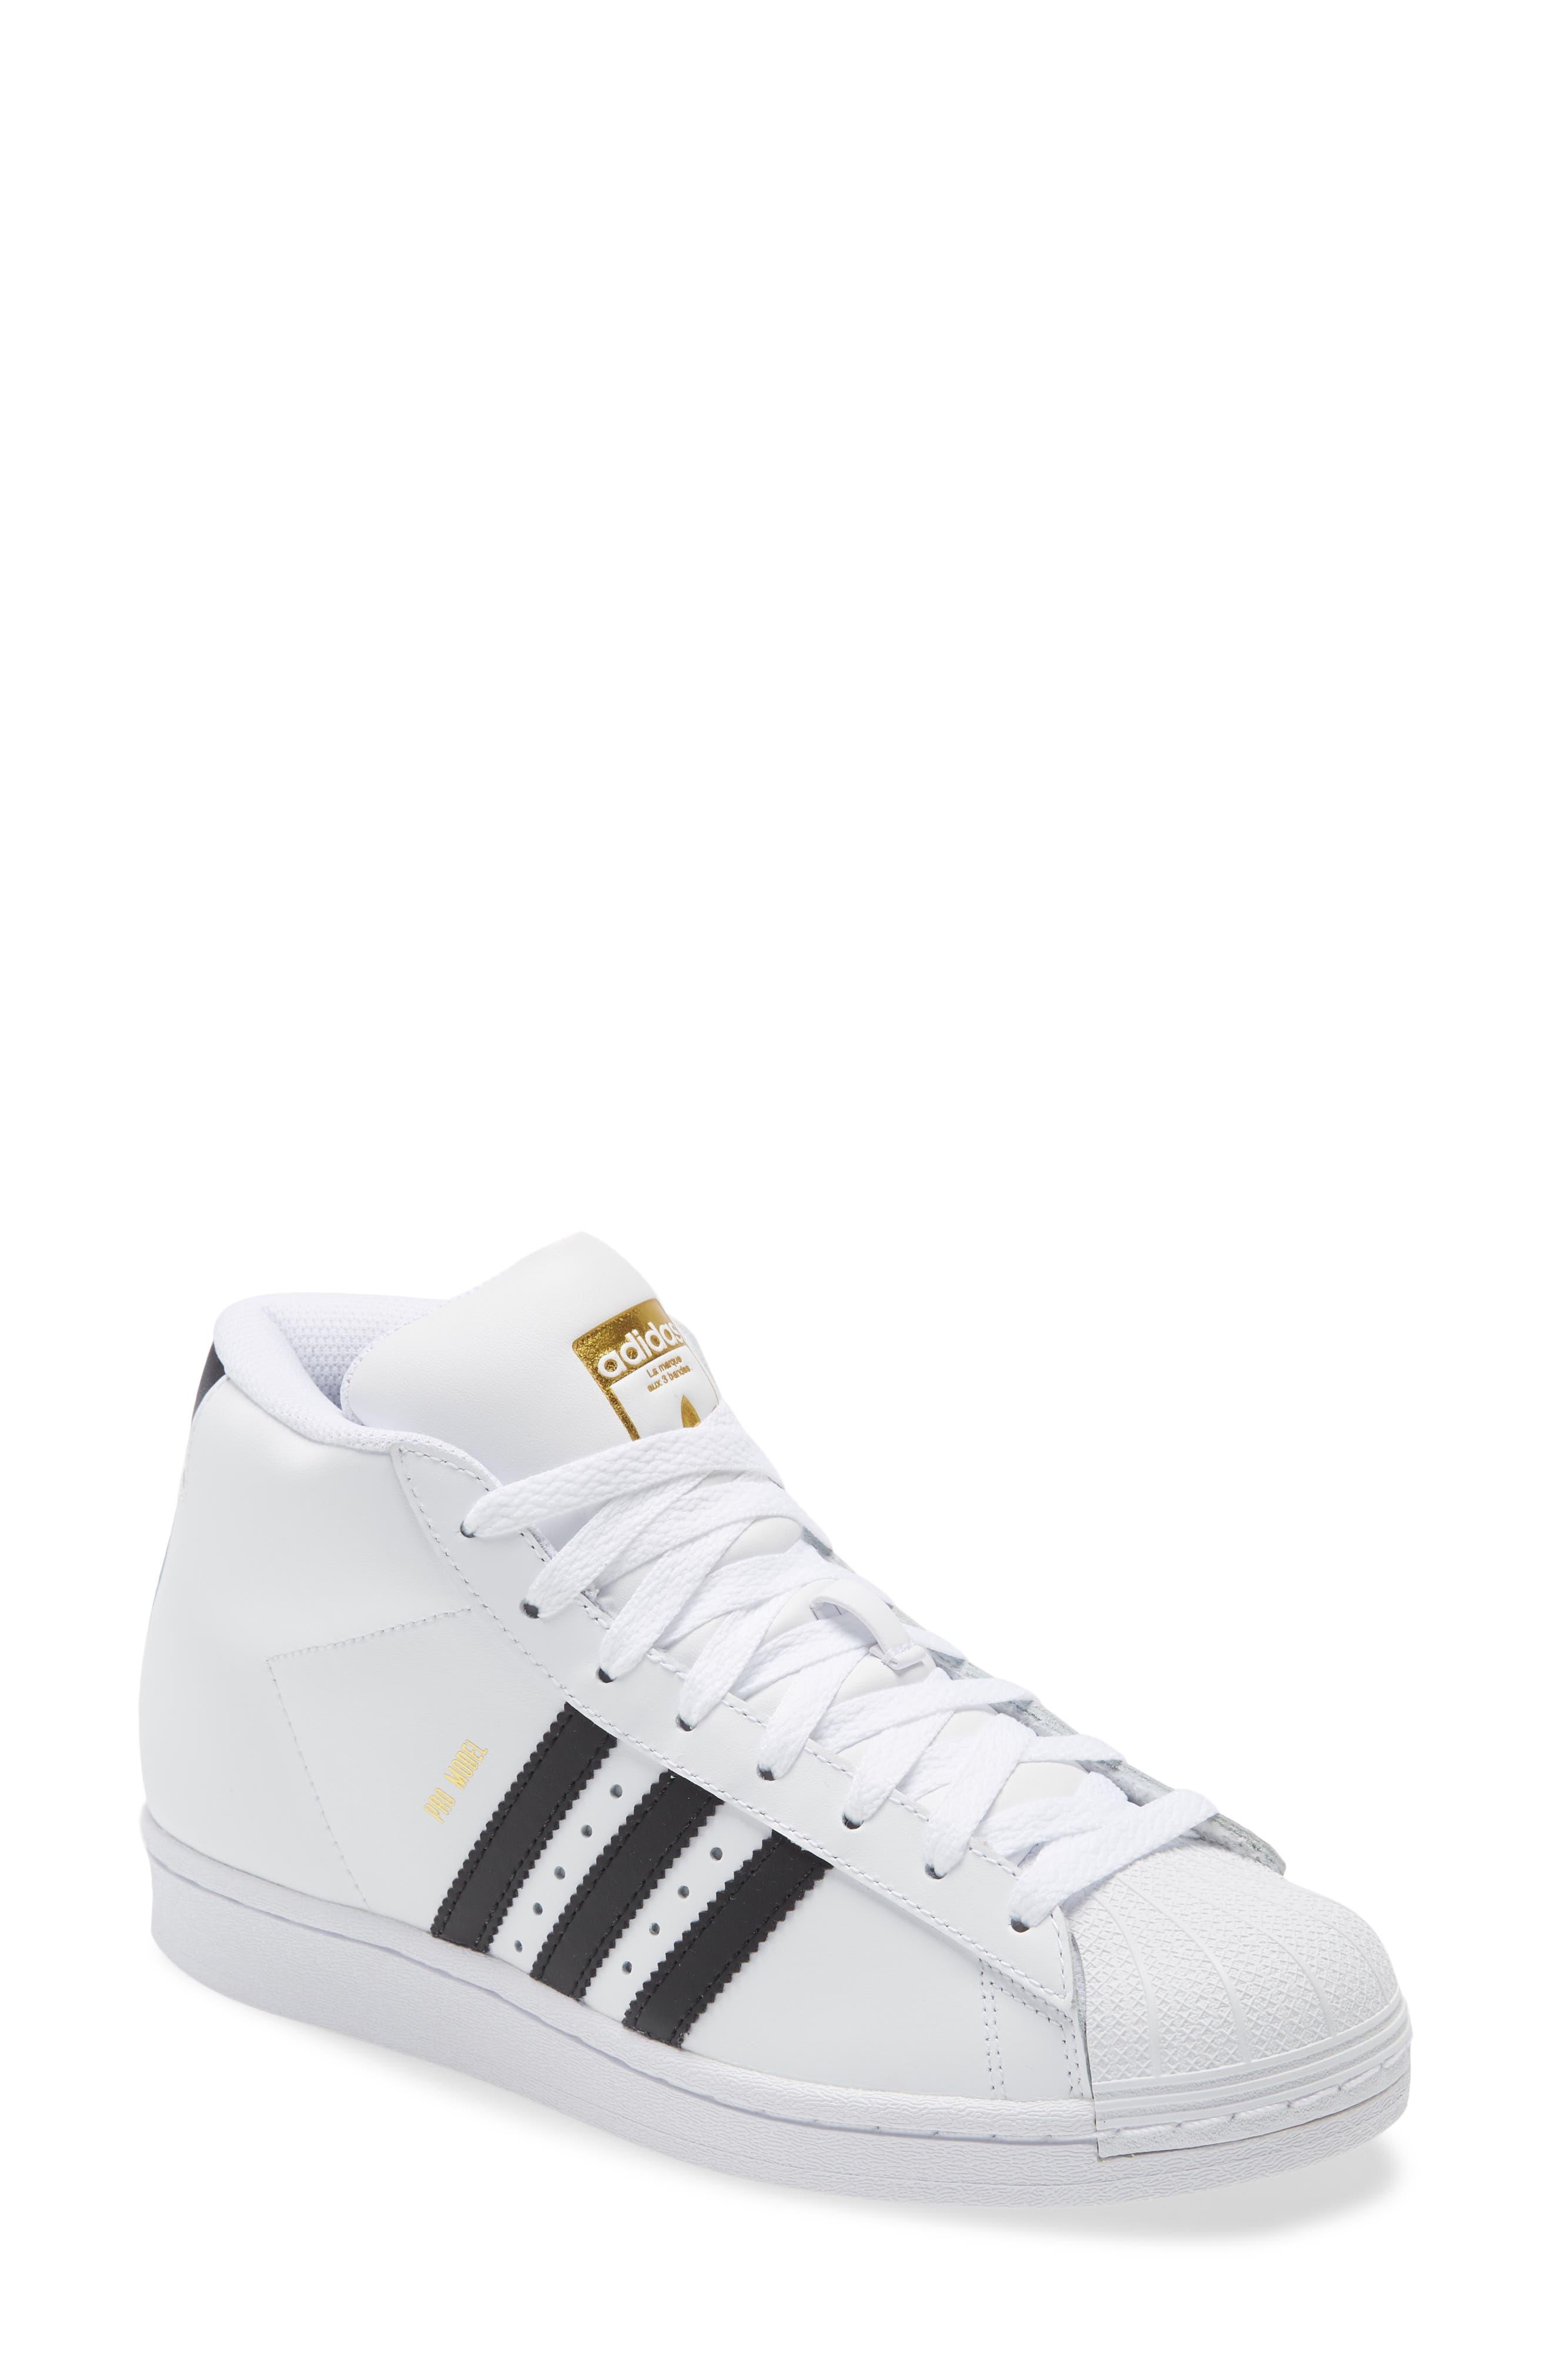 Adidas Pro Model J Mid Top Sneaker (Big Kid) | Nordstrom